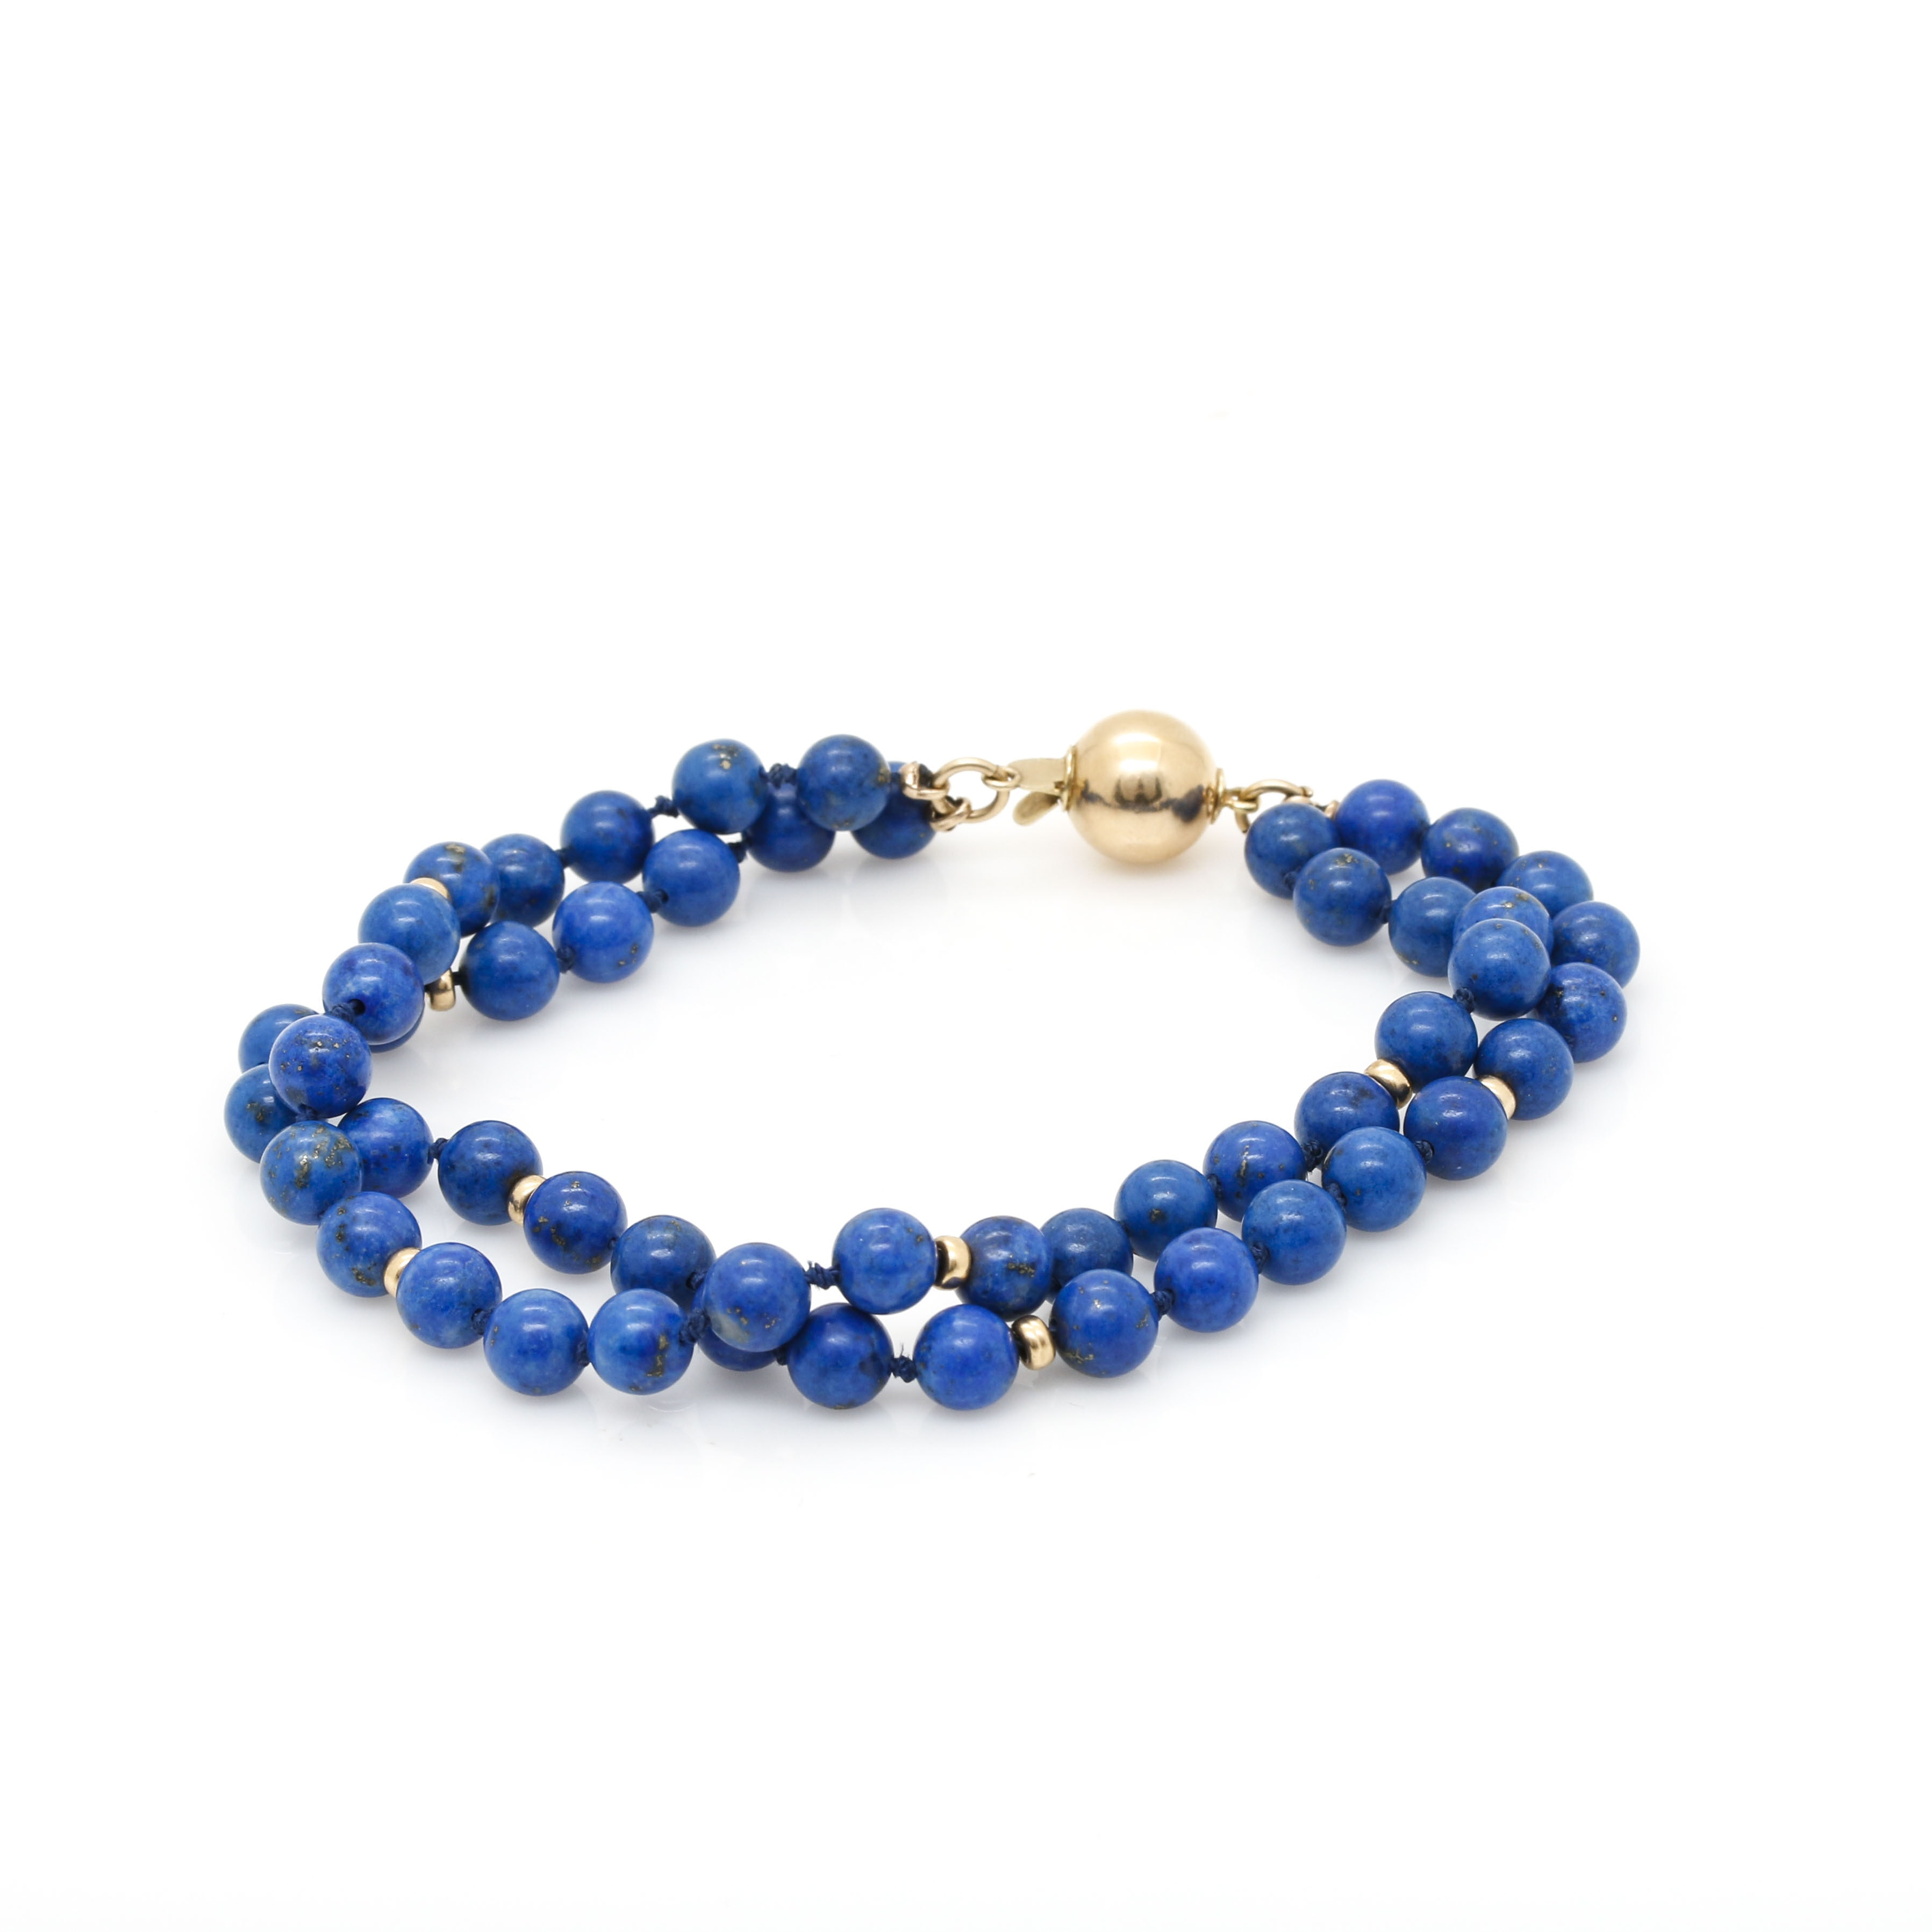 14K Yellow Gold Lapis Lazuli Double Strand Bracelet